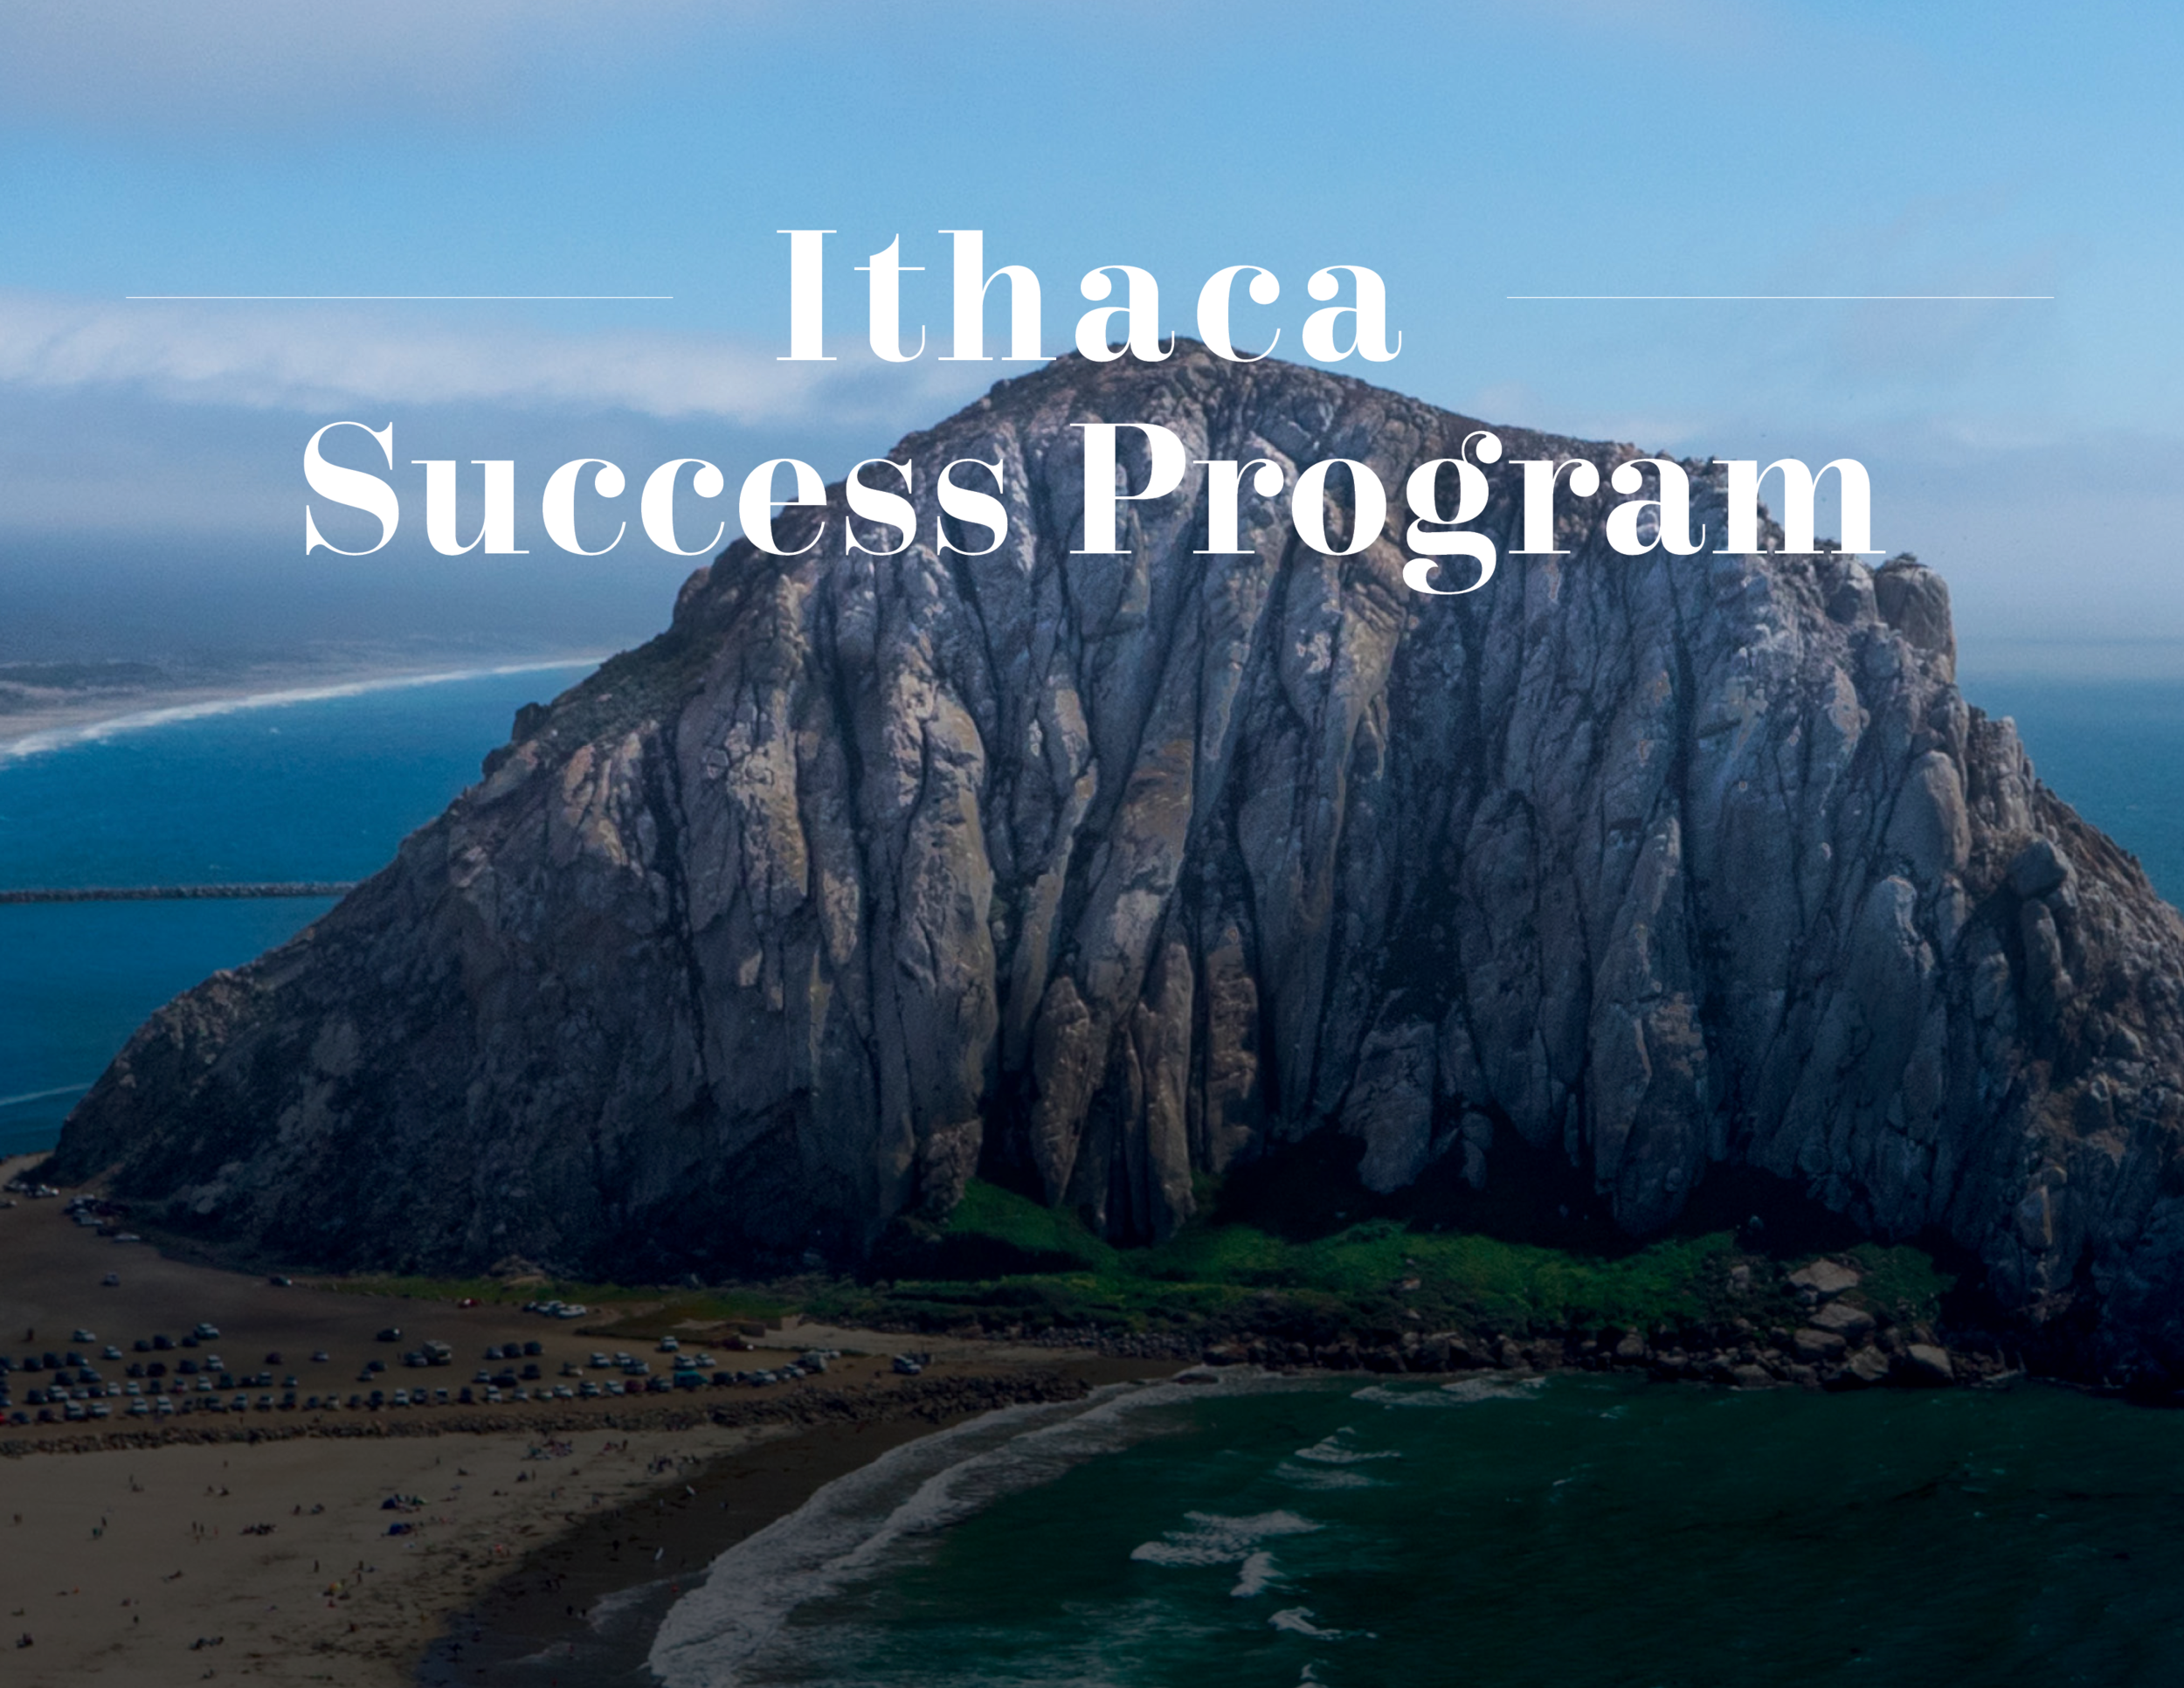 Ithaca-success-program.png